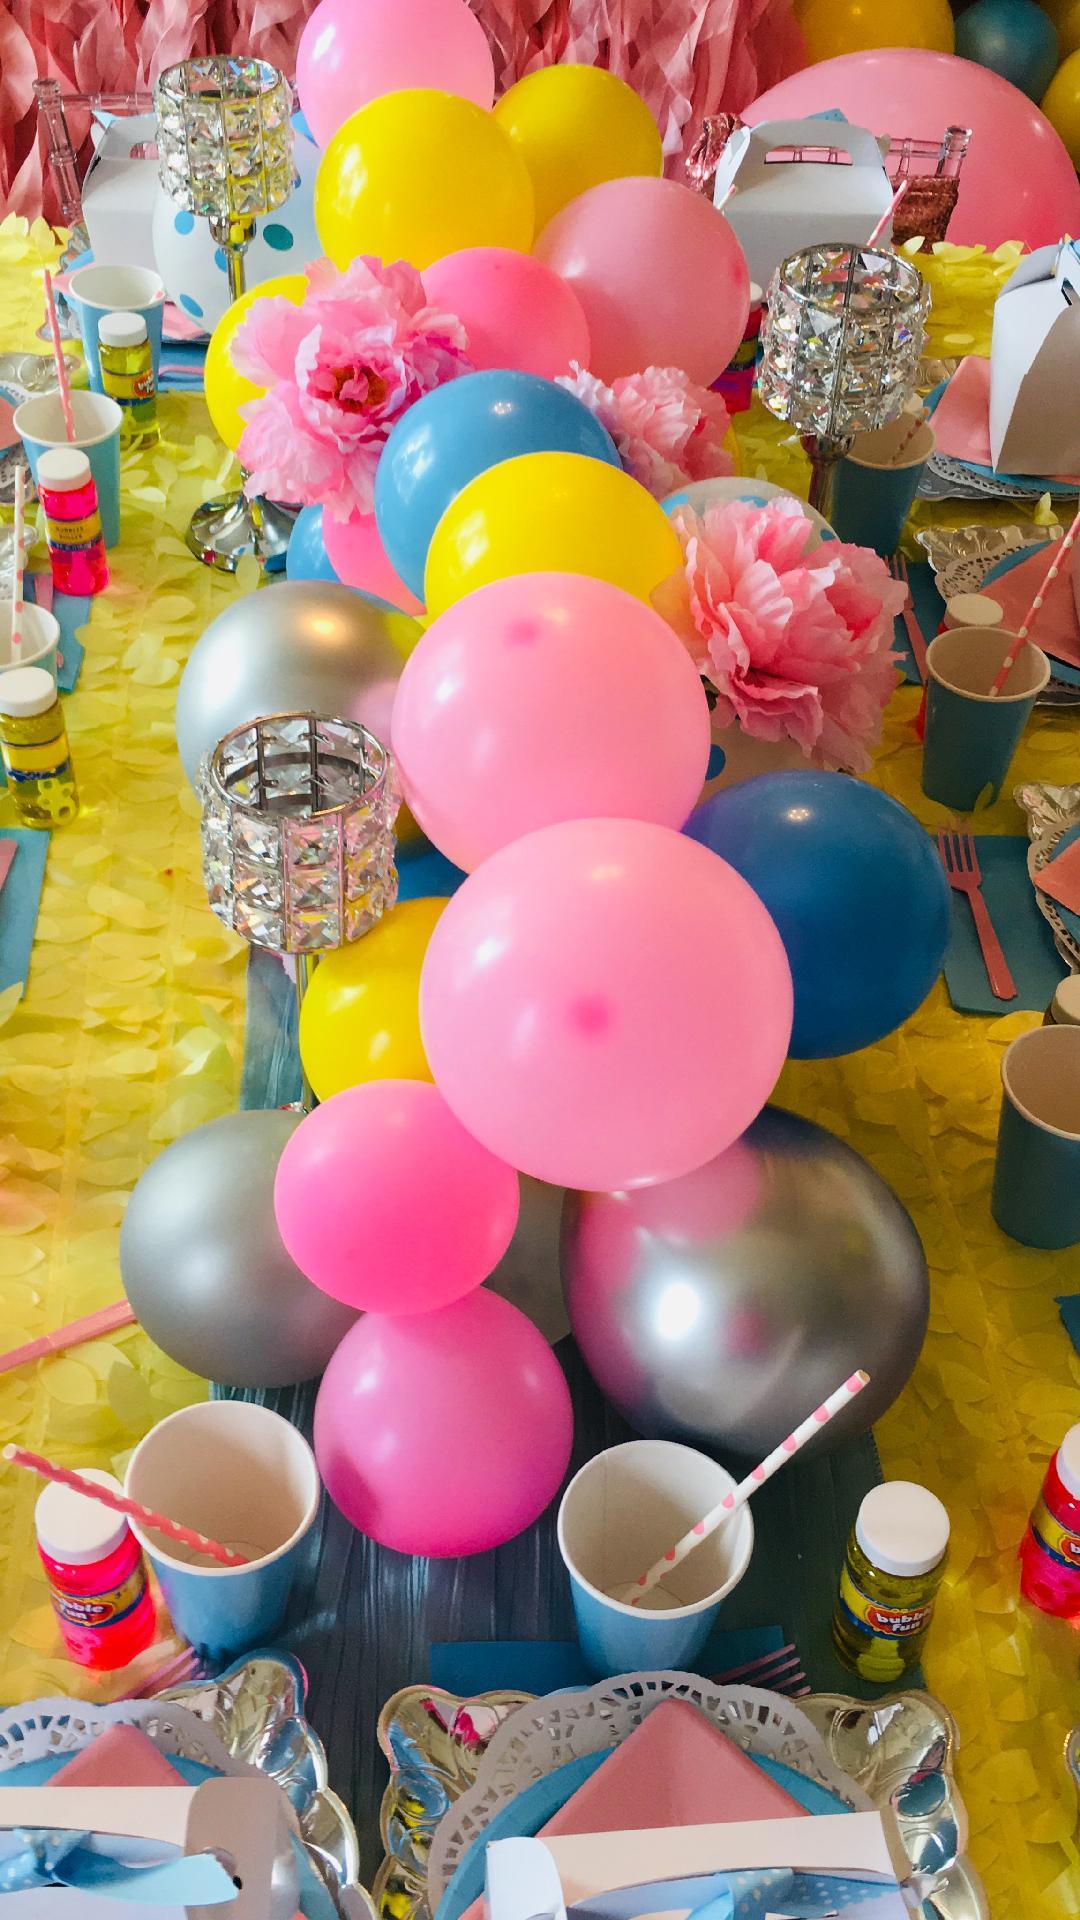 houston kids childrens birthday party planner 7.jpg